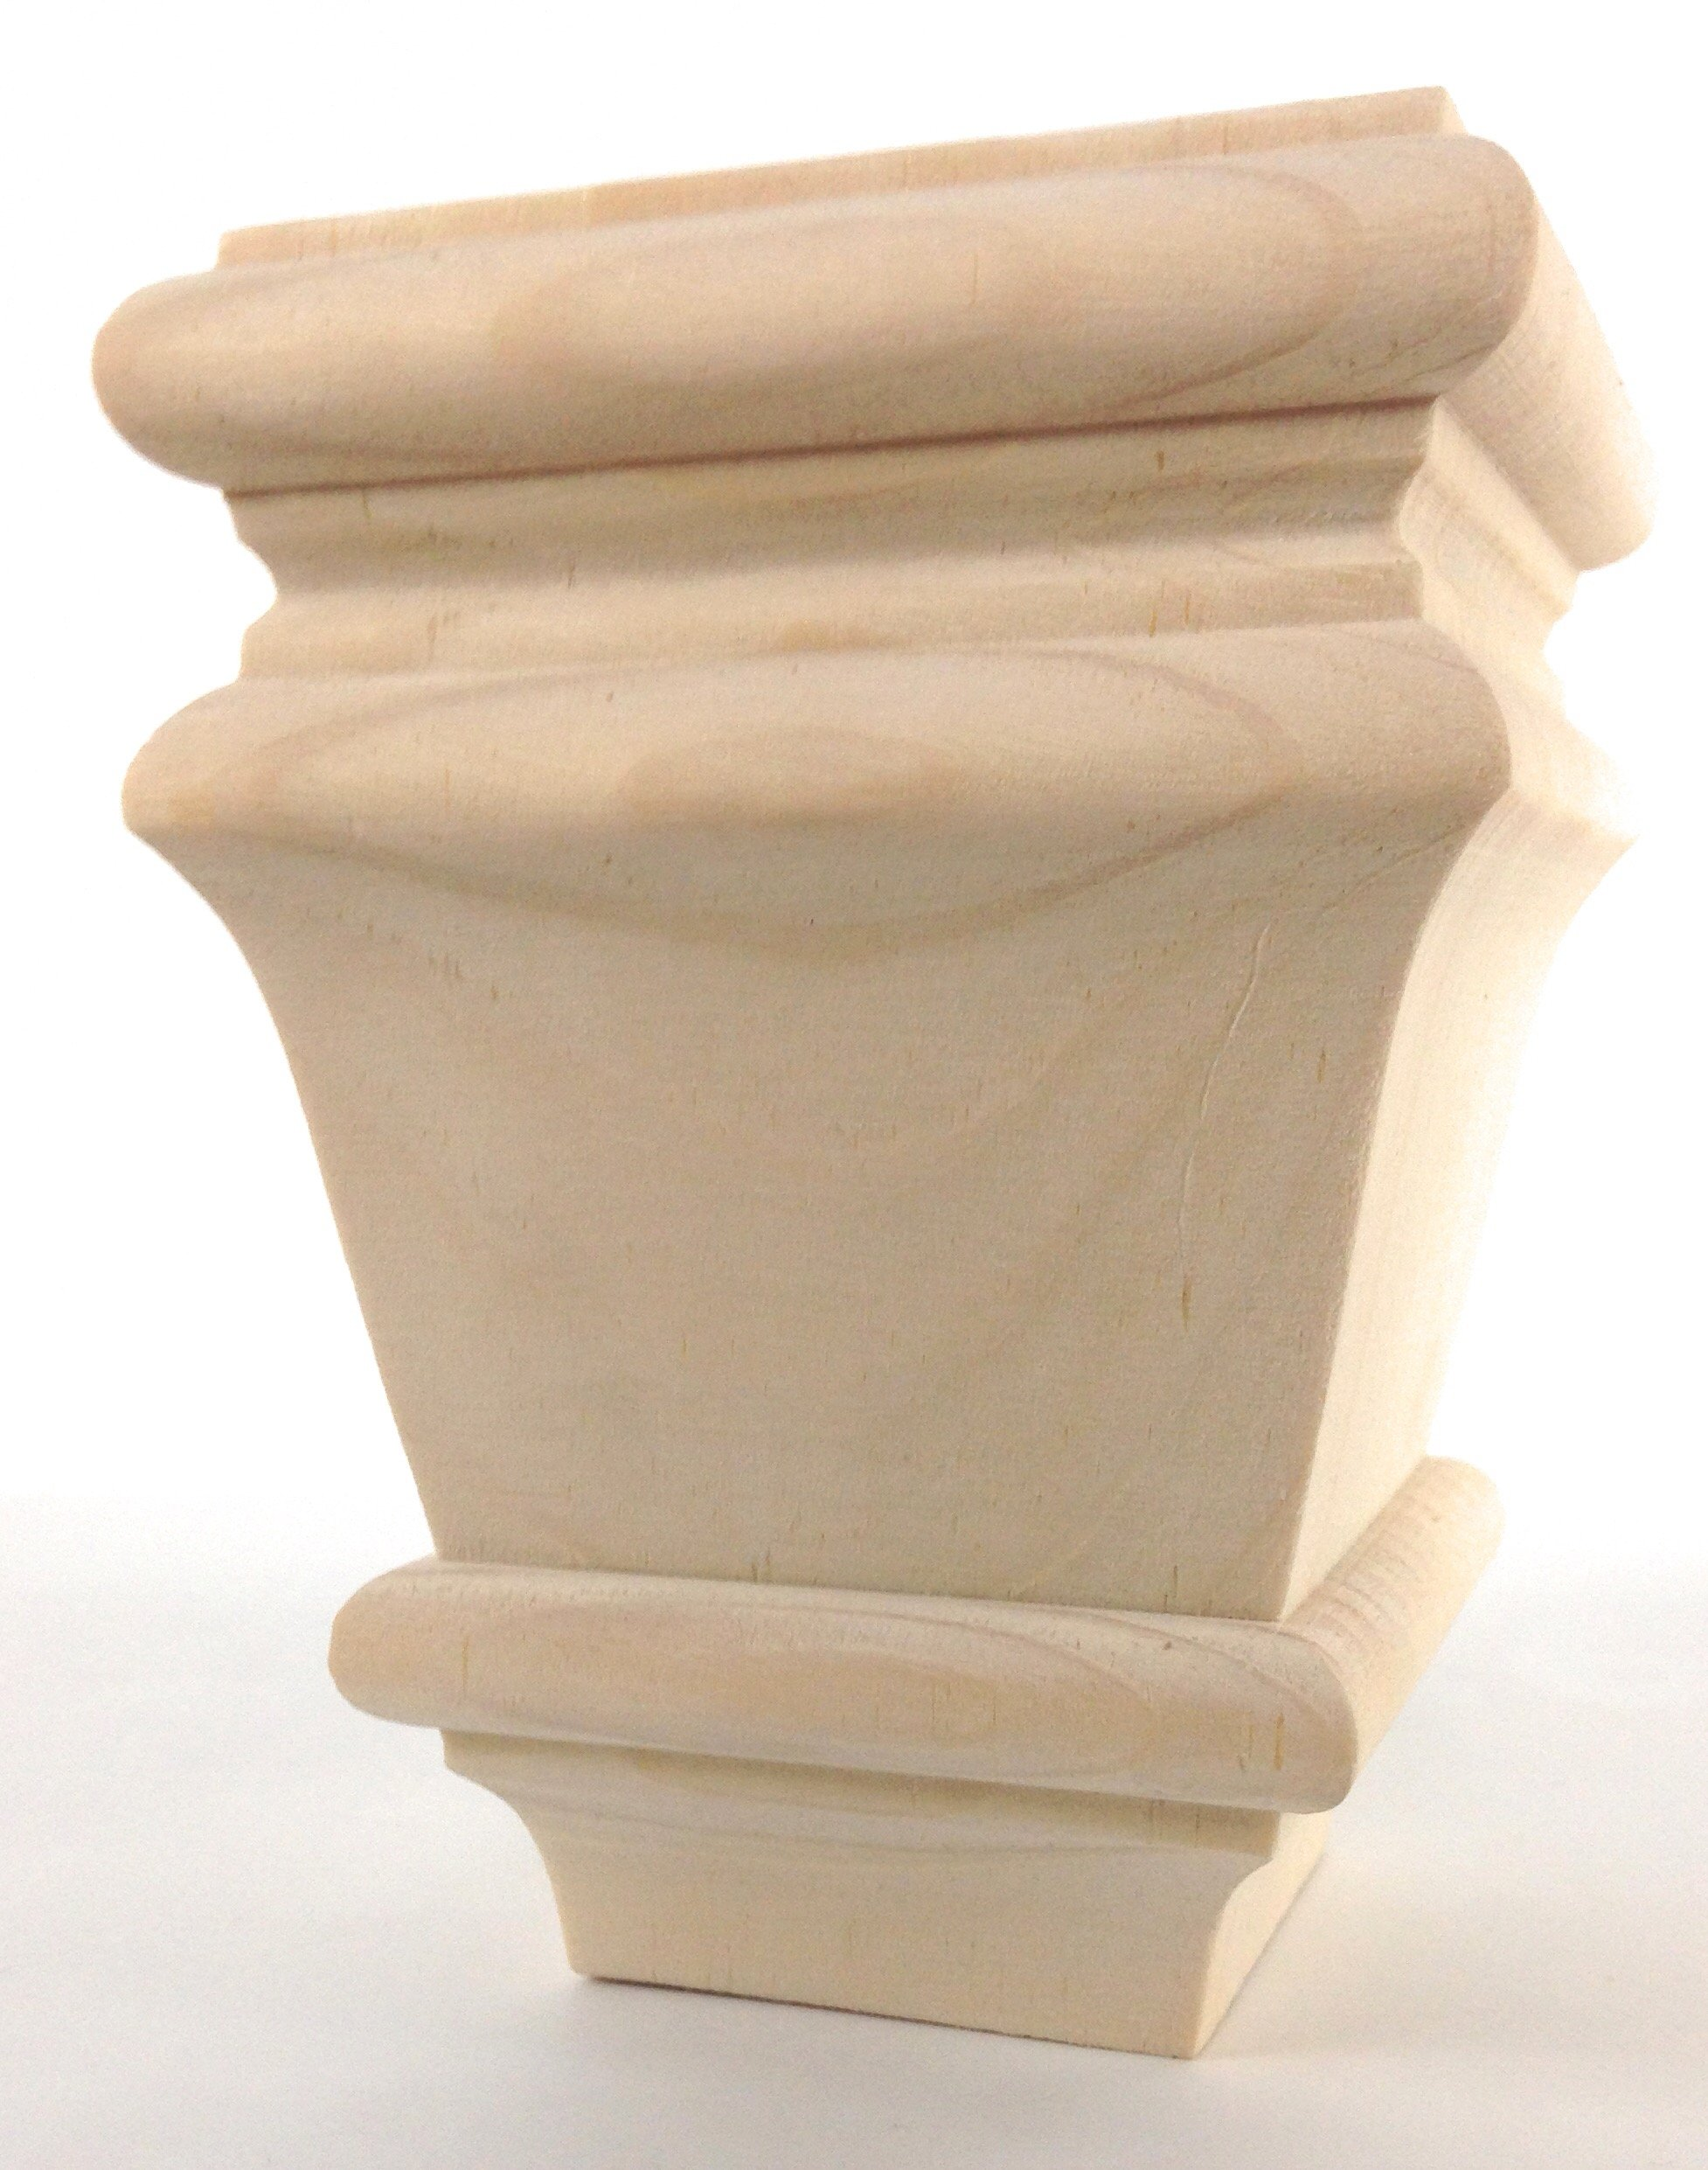 Square Baymont Bun Foot - 4 1/2'' tall x 3 3/8'' Wide (Pine)